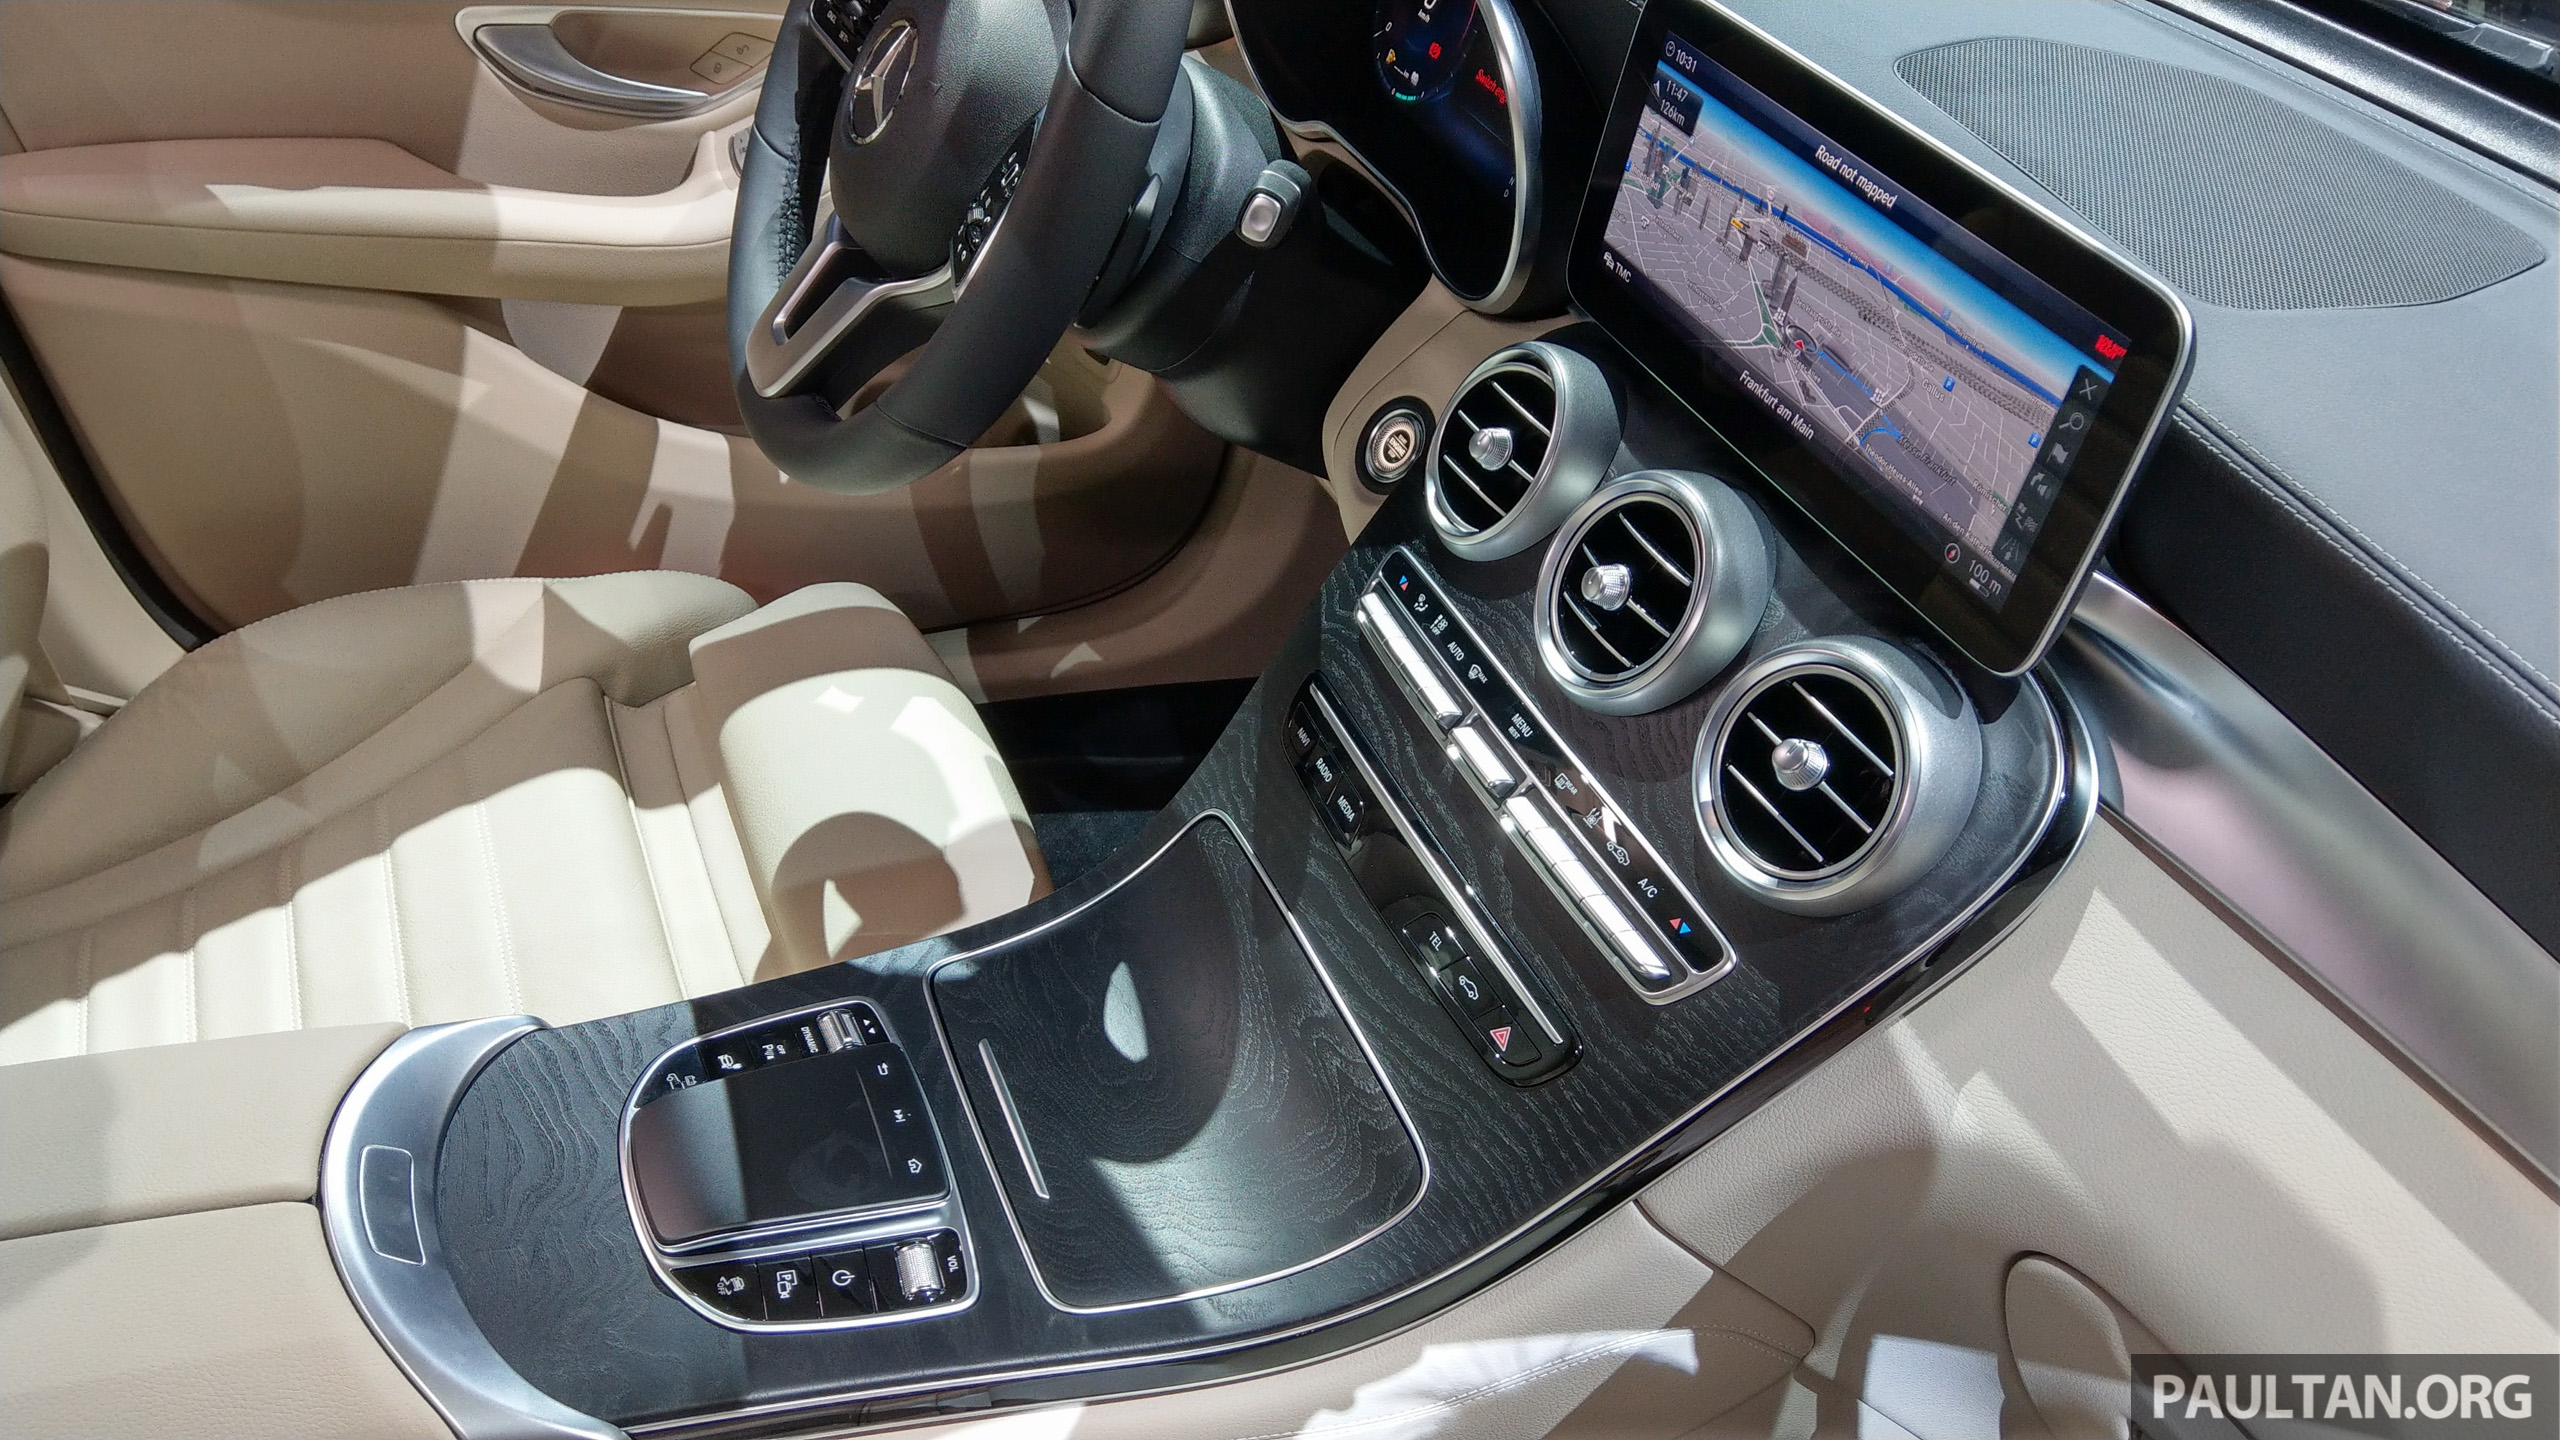 https://s3.paultan.org/image/2017/09/Mercedes-Benz-F-Cell-interior-11.jpg